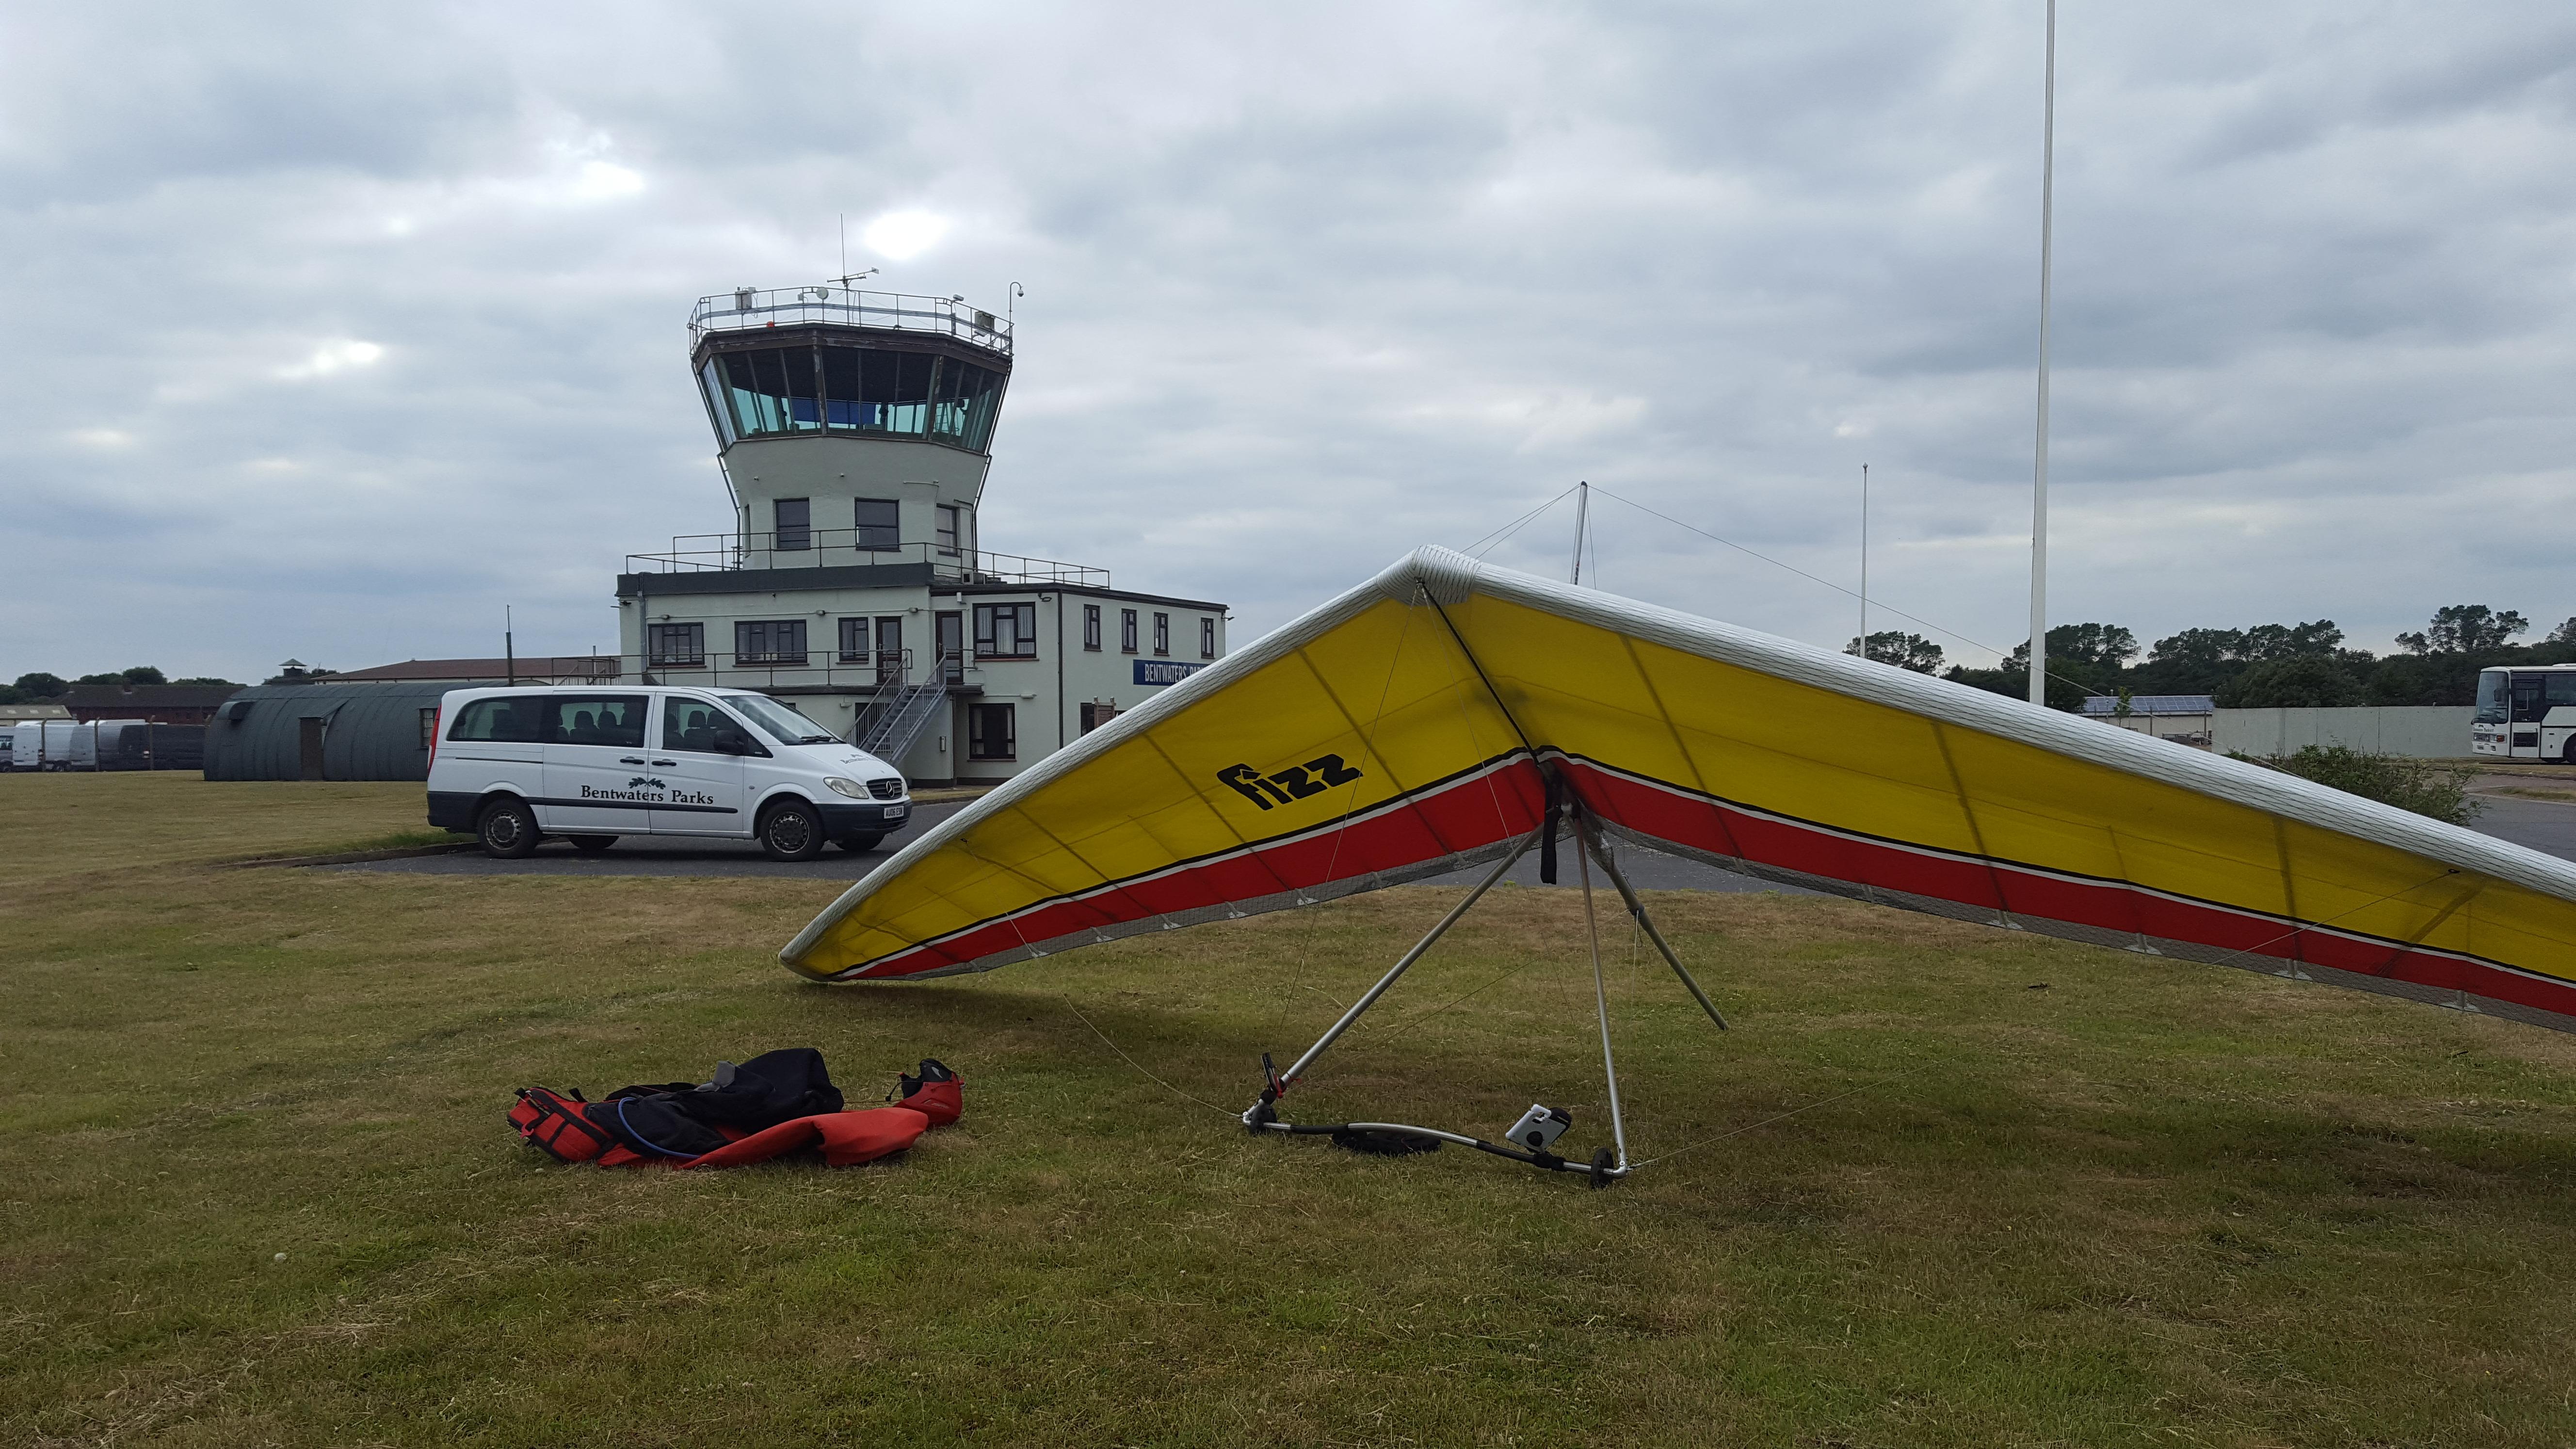 Landed at RAF Bentwalters